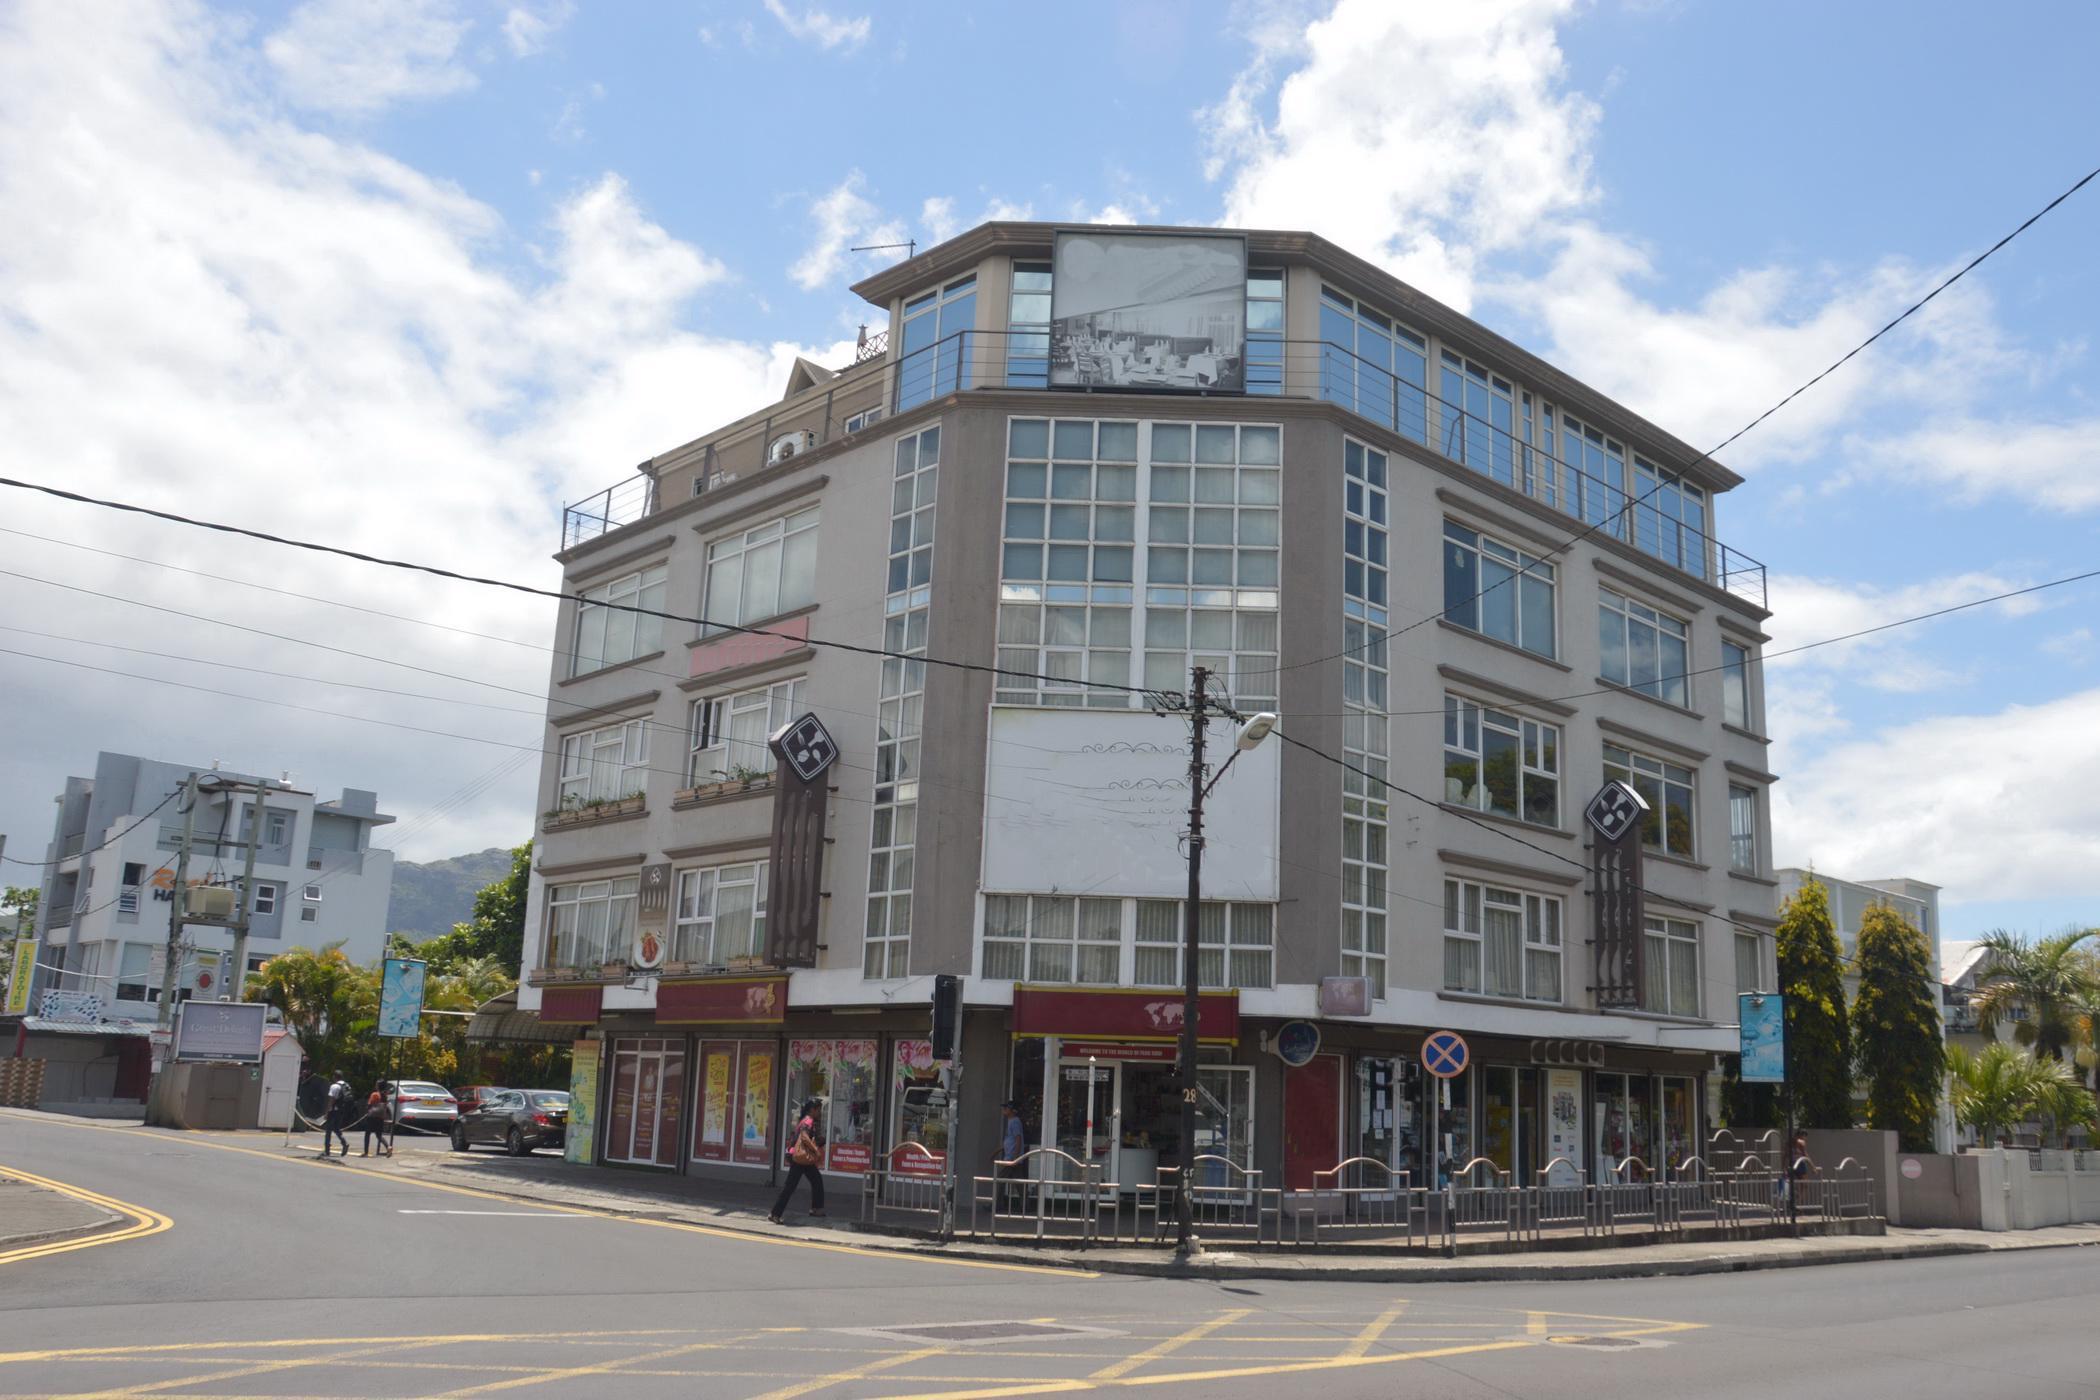 1645 m² commercial retail property for sale in Quatre Bornes (Mauritius)